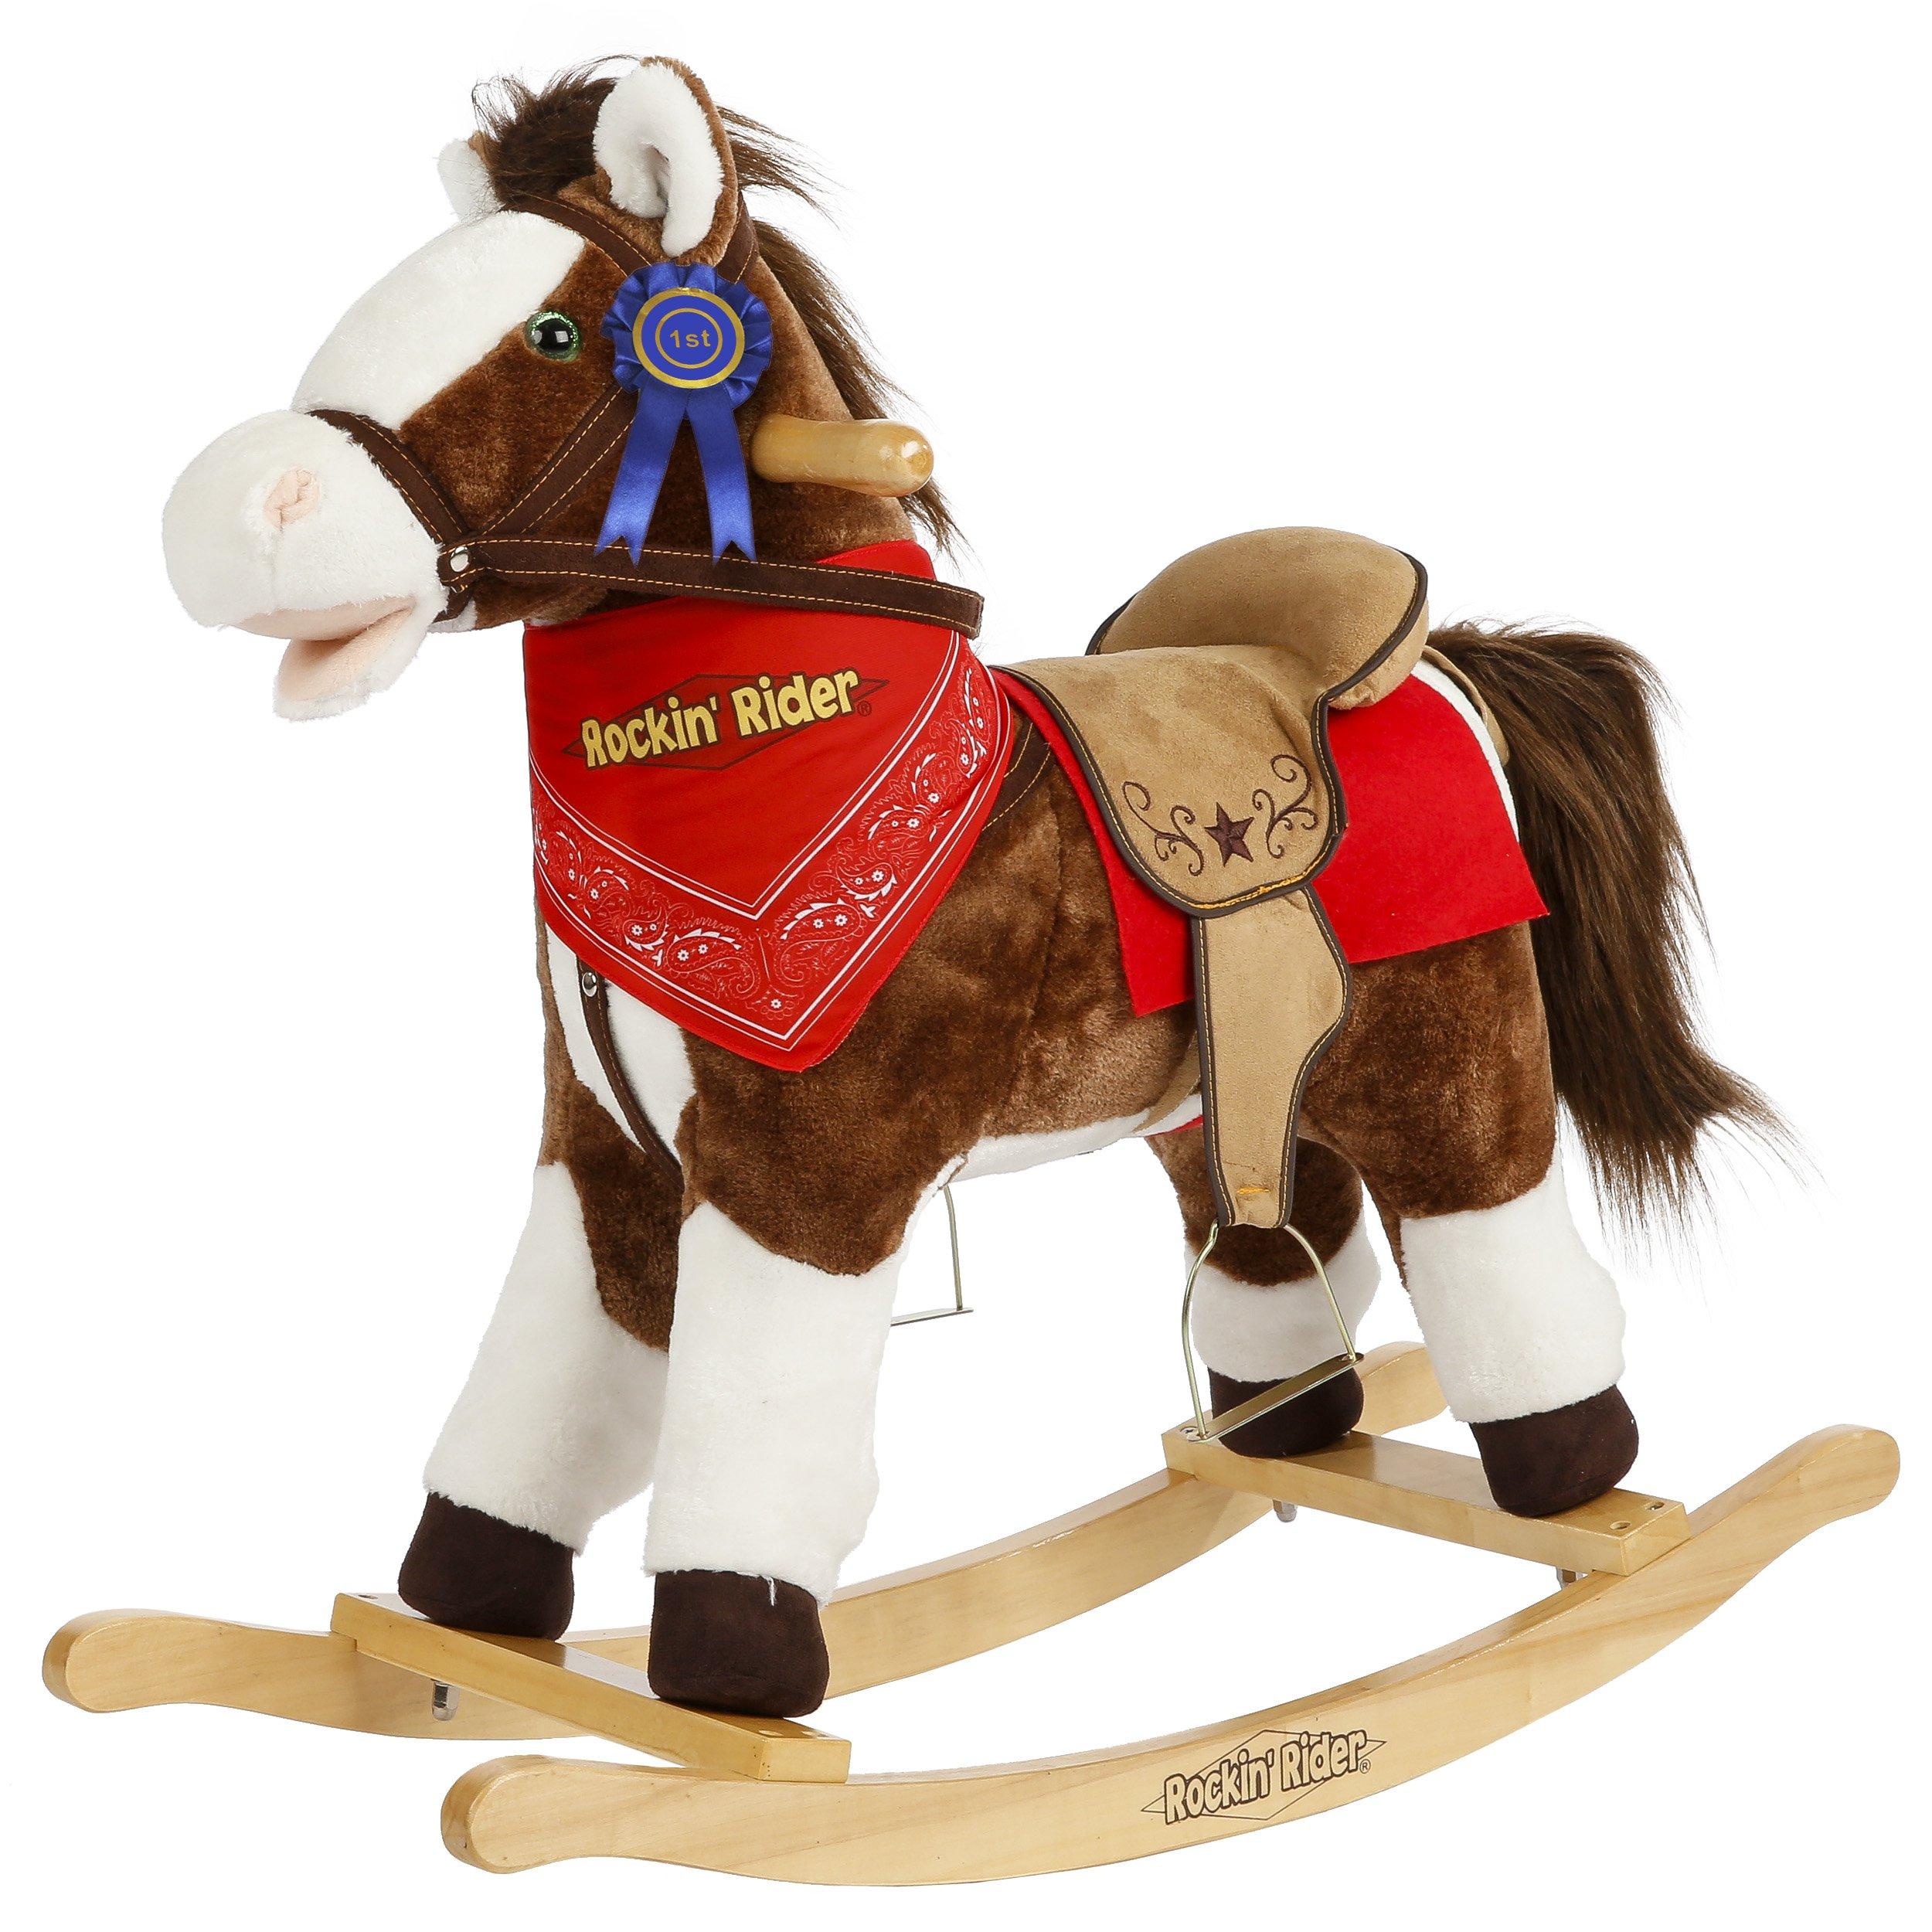 Rockin' Rider Laredo Rocking Horse Ride On